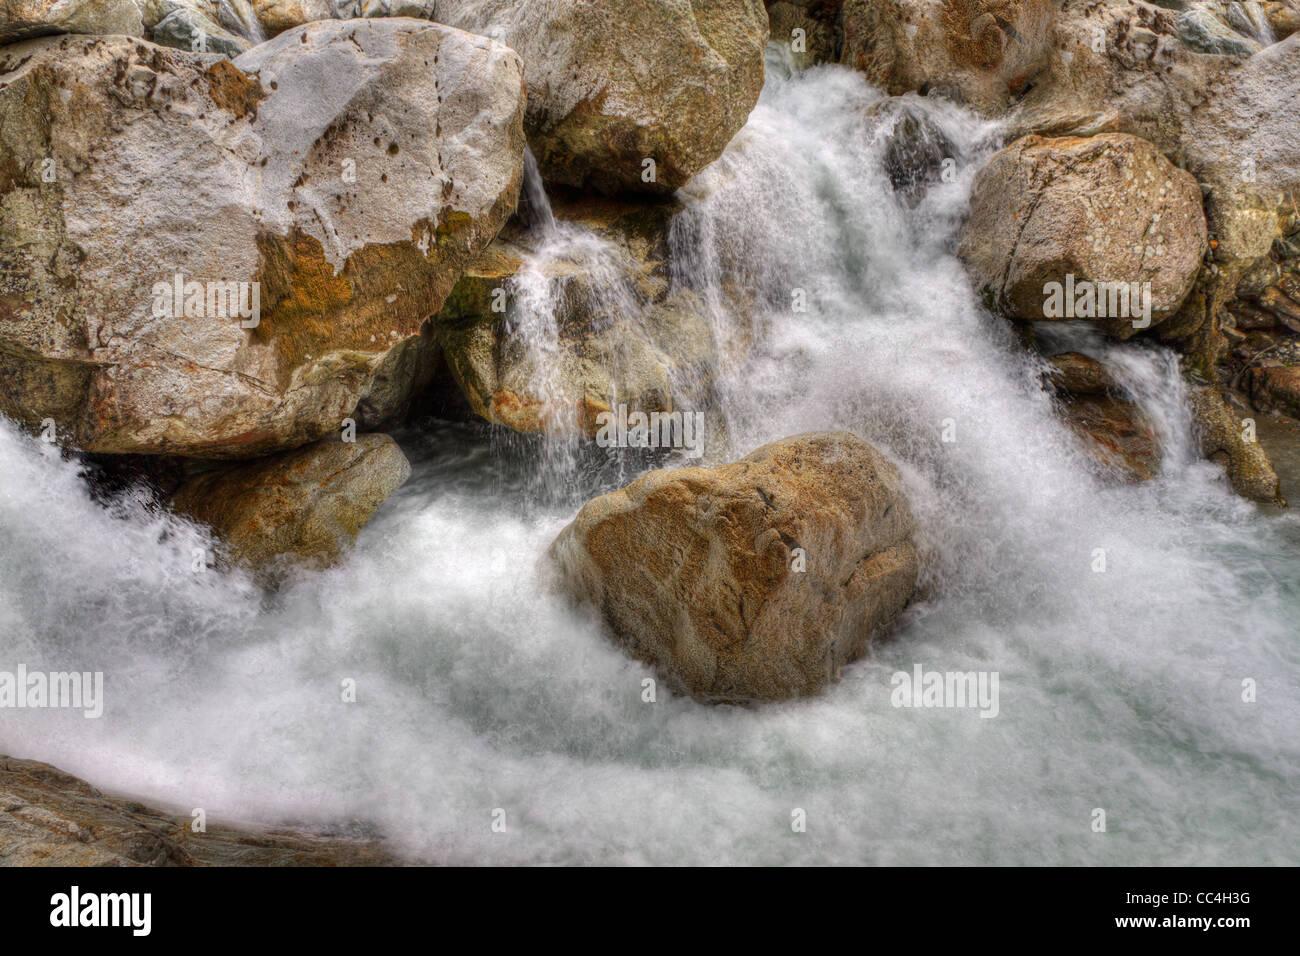 mountain stream gushing down as white water over rocks - Stock Image